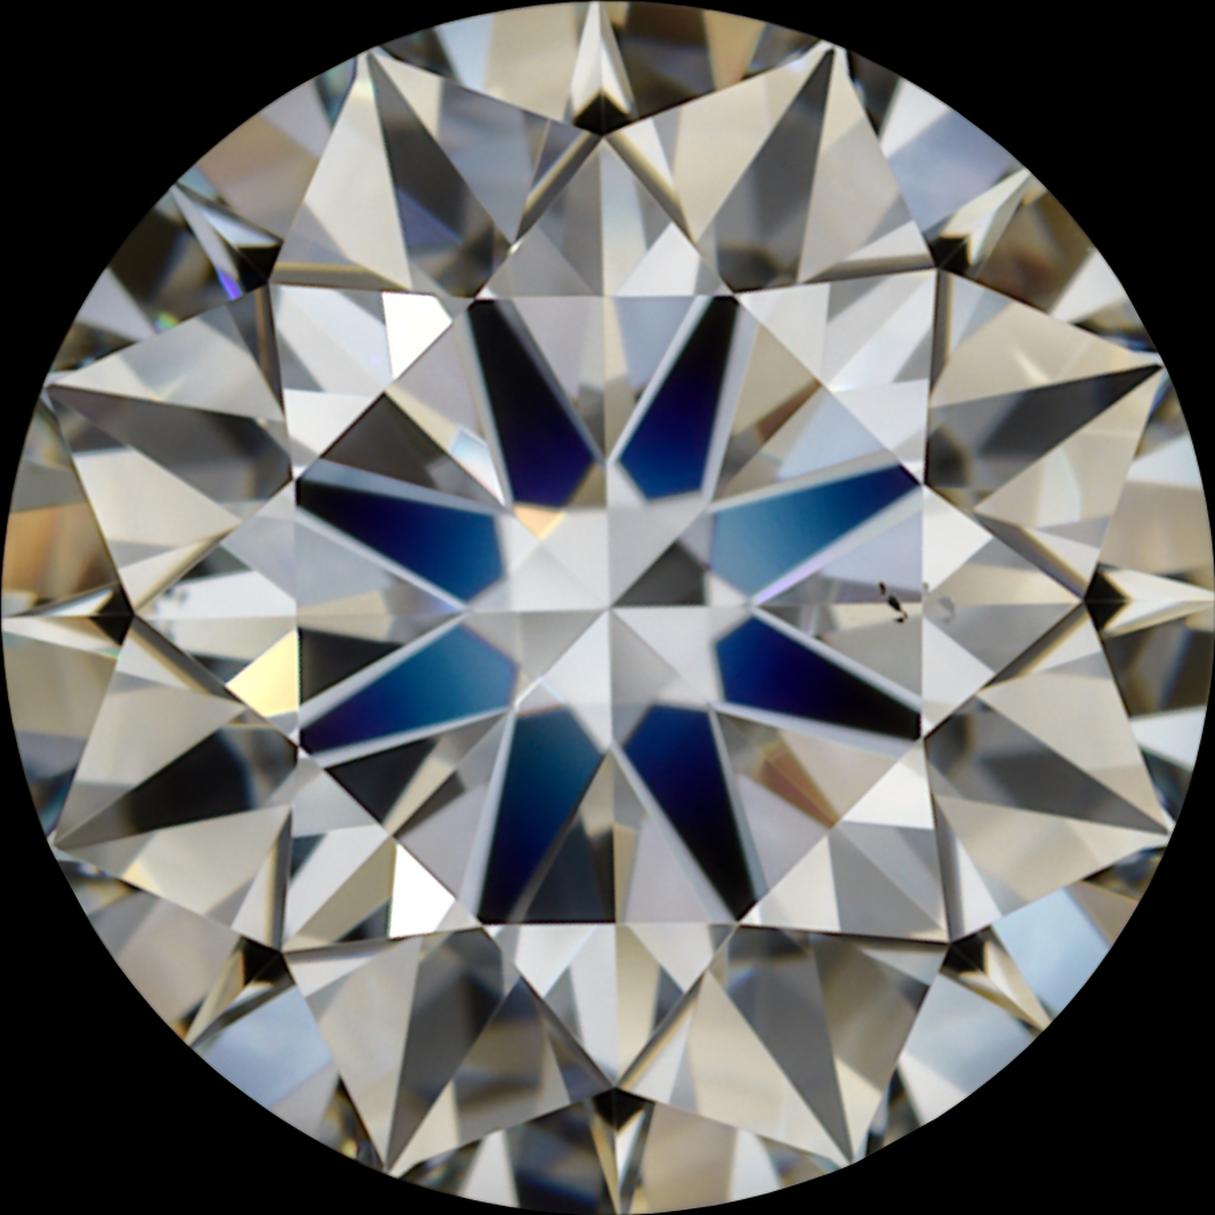 https://cdn.briangavindiamonds.com/files/mp4/AGS-104107436008/AGS-104107436008-Office-02.mp4